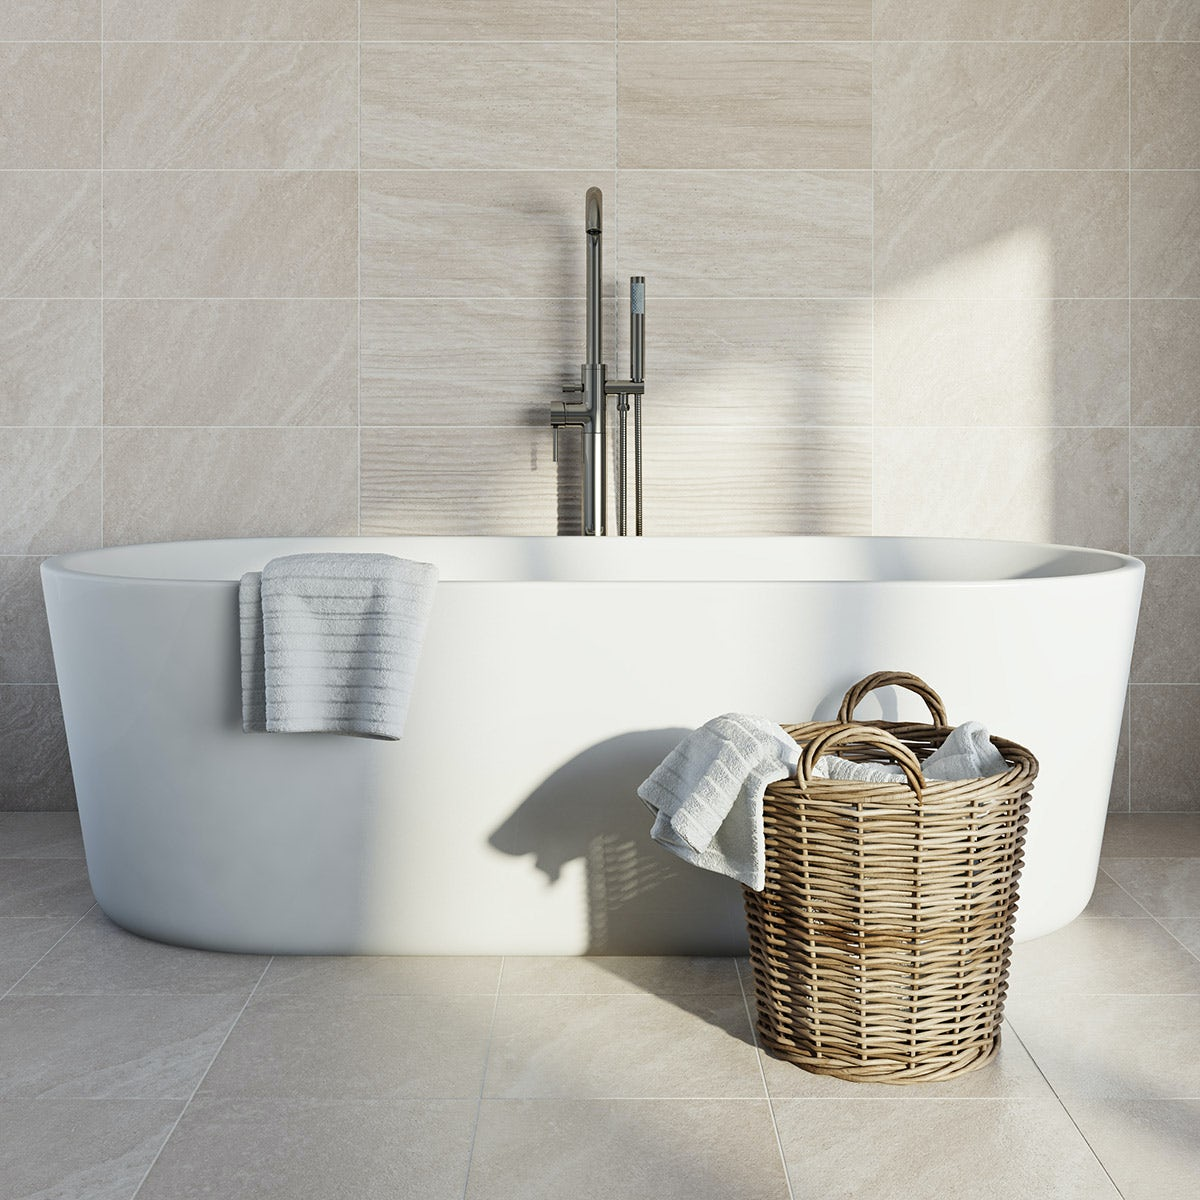 British ceramic tile pumice grey wave matt tile 248mm x 498mm british ceramic tile pumice grey wave matt tile 248mm x 498mm dailygadgetfo Images